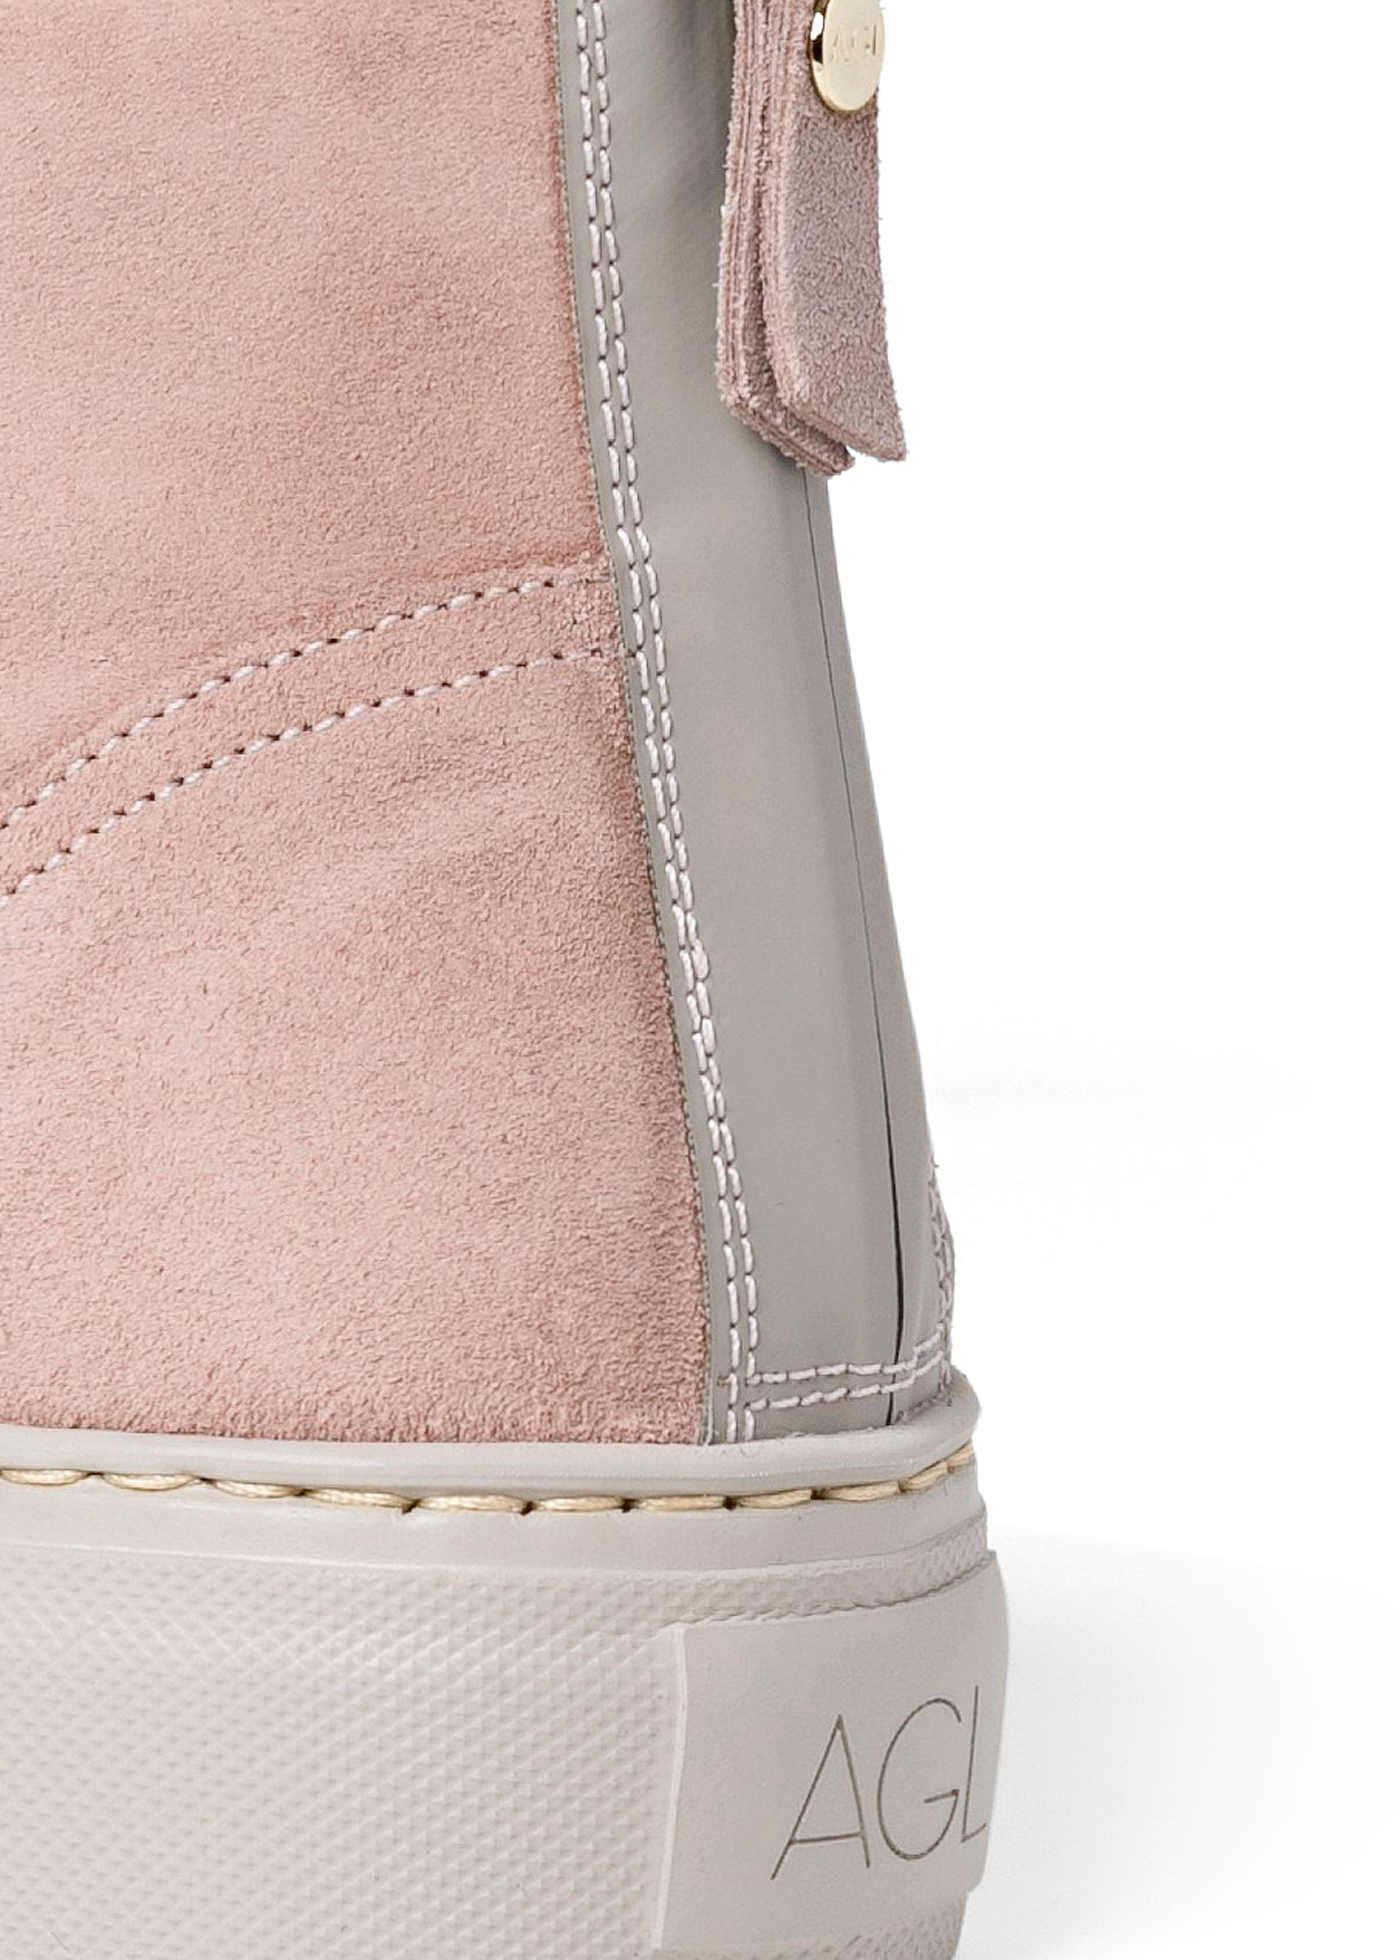 MAEVA Sneaker Boot image number 3